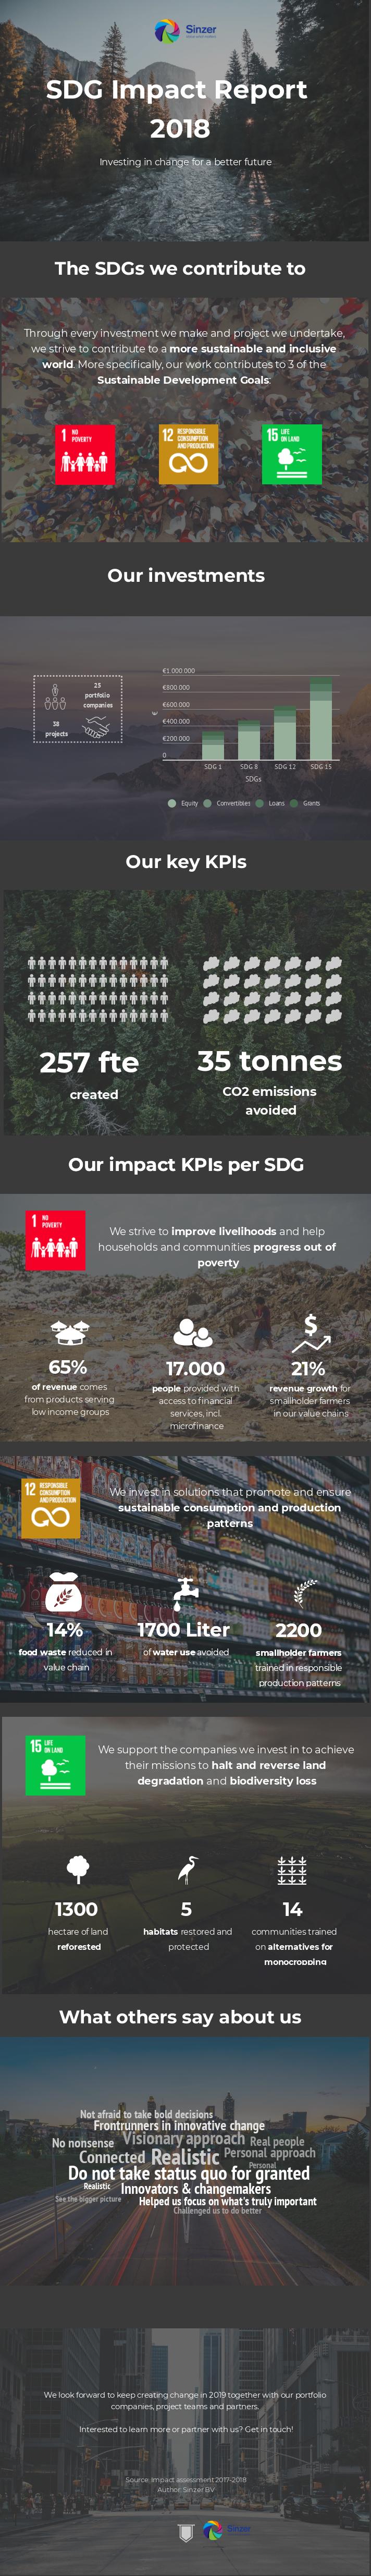 SDG-impact-report-template.png